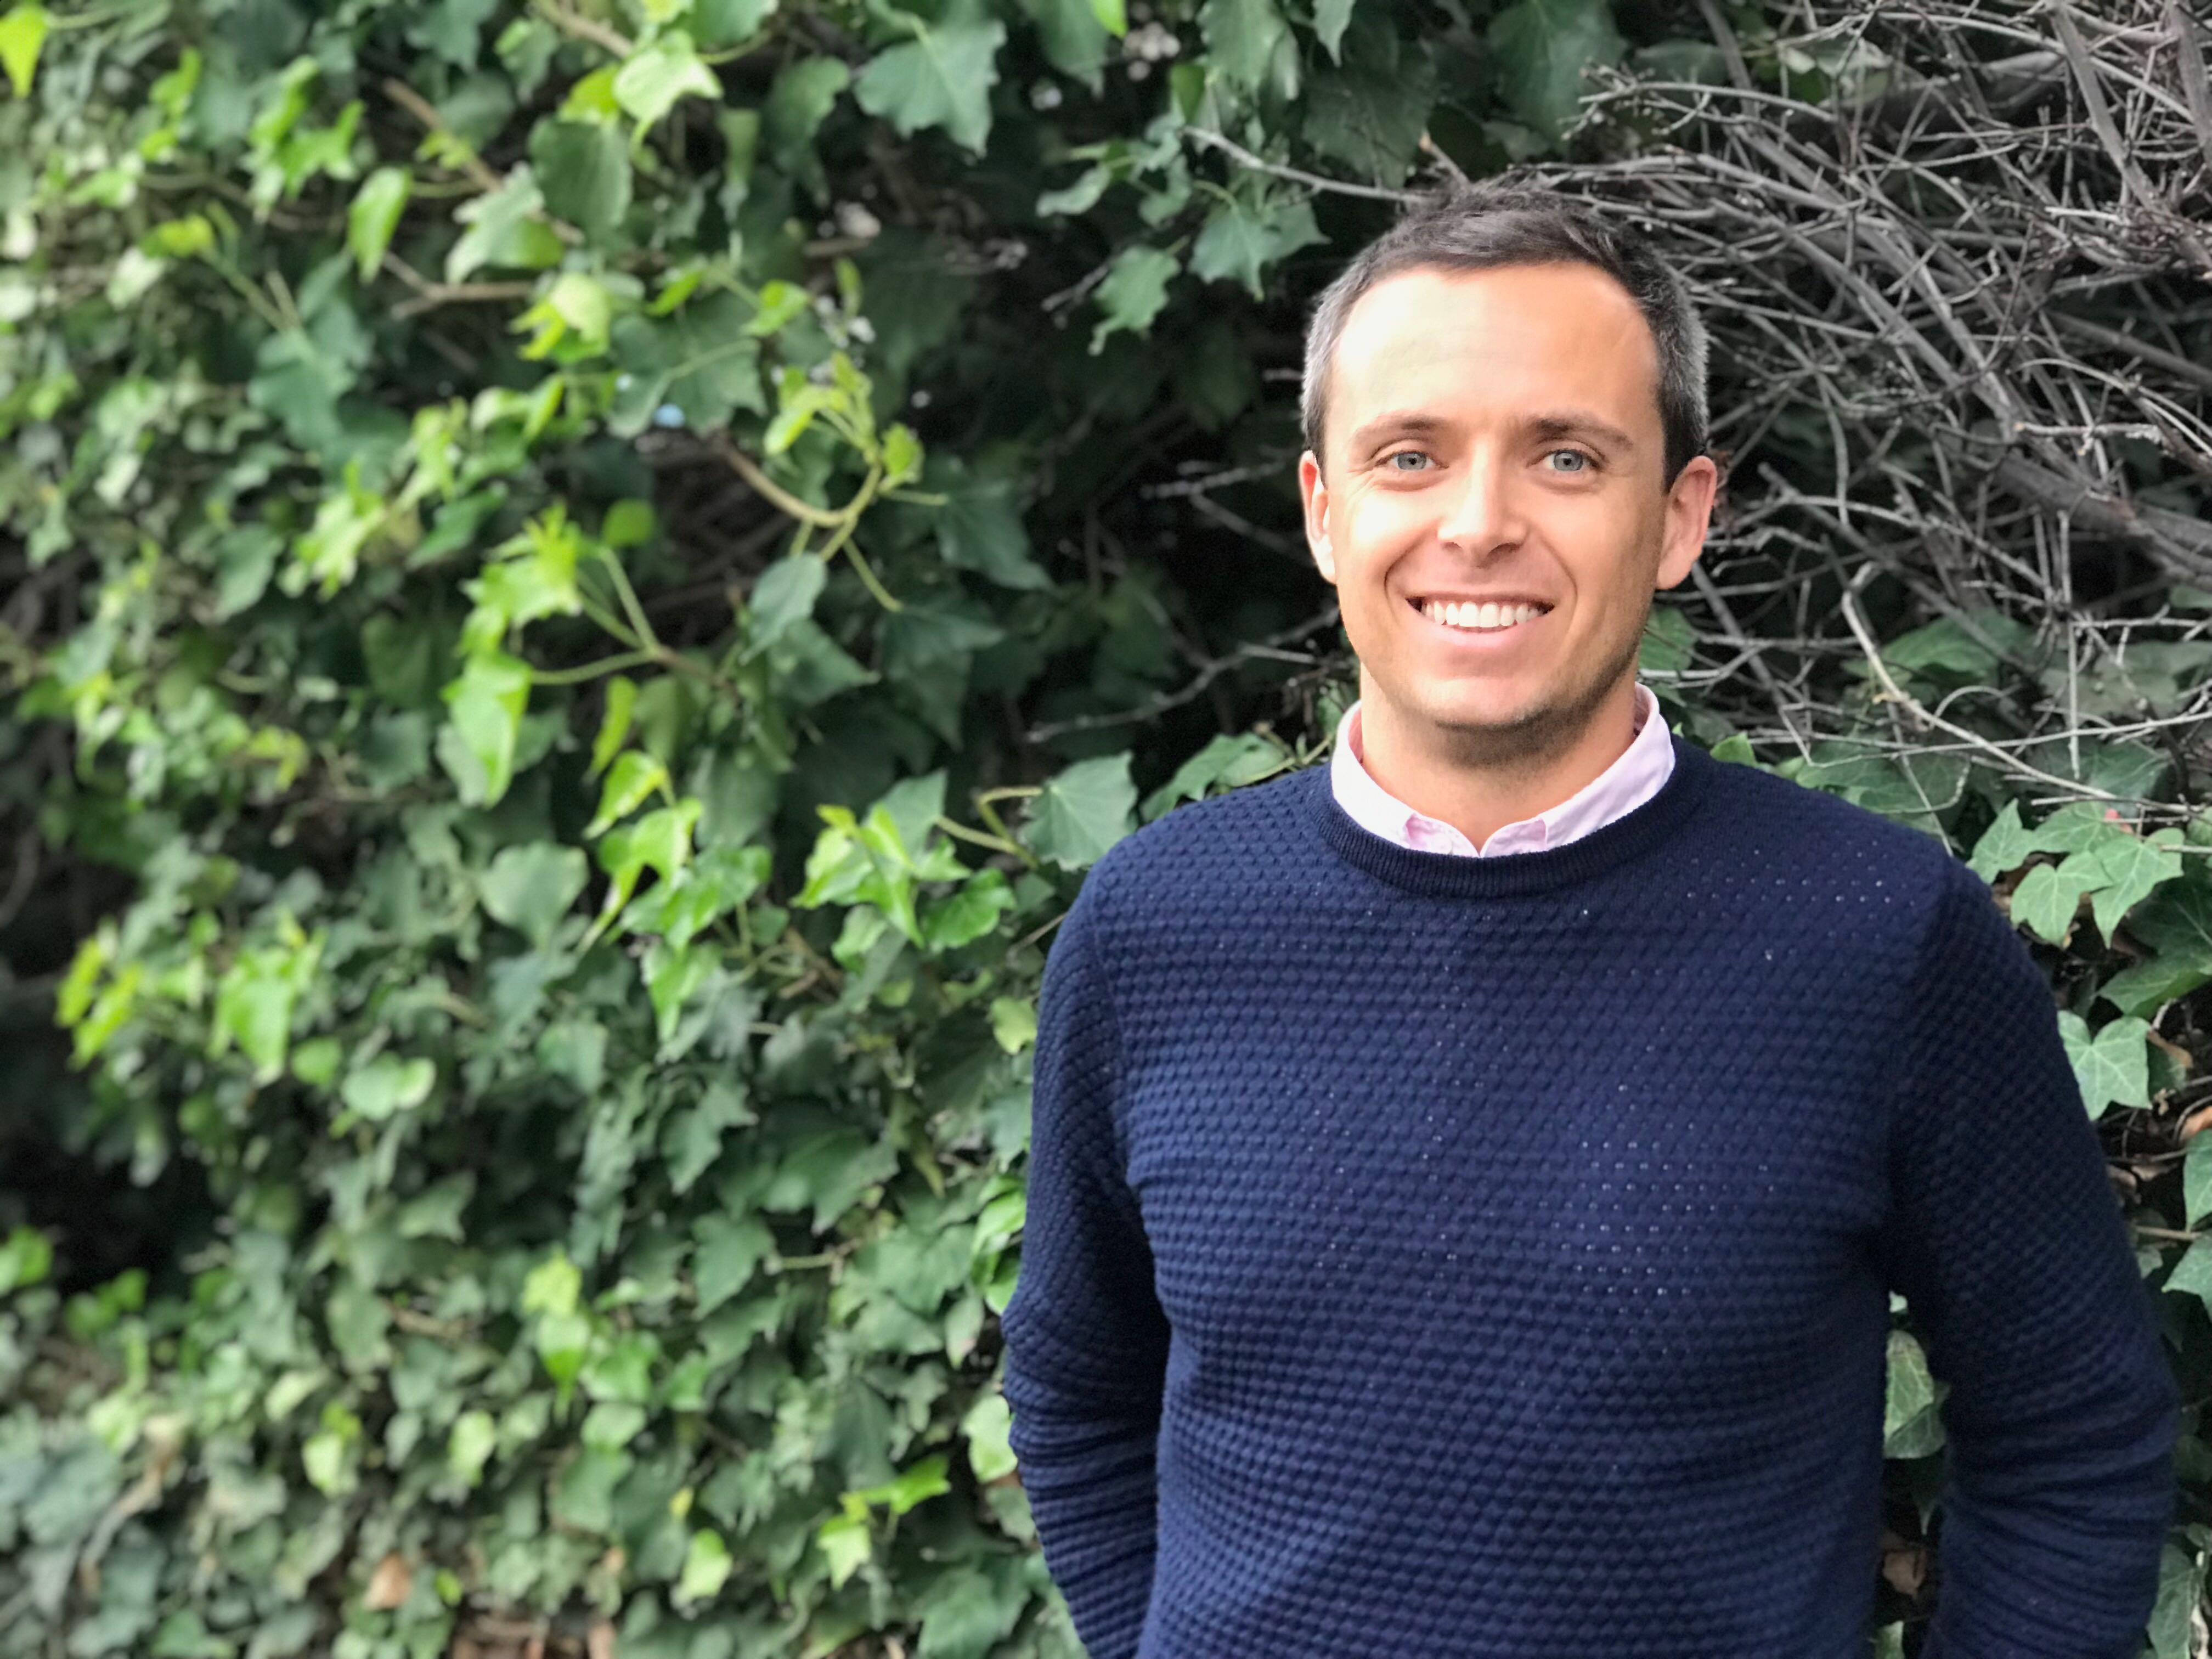 Tomas Ancelovici